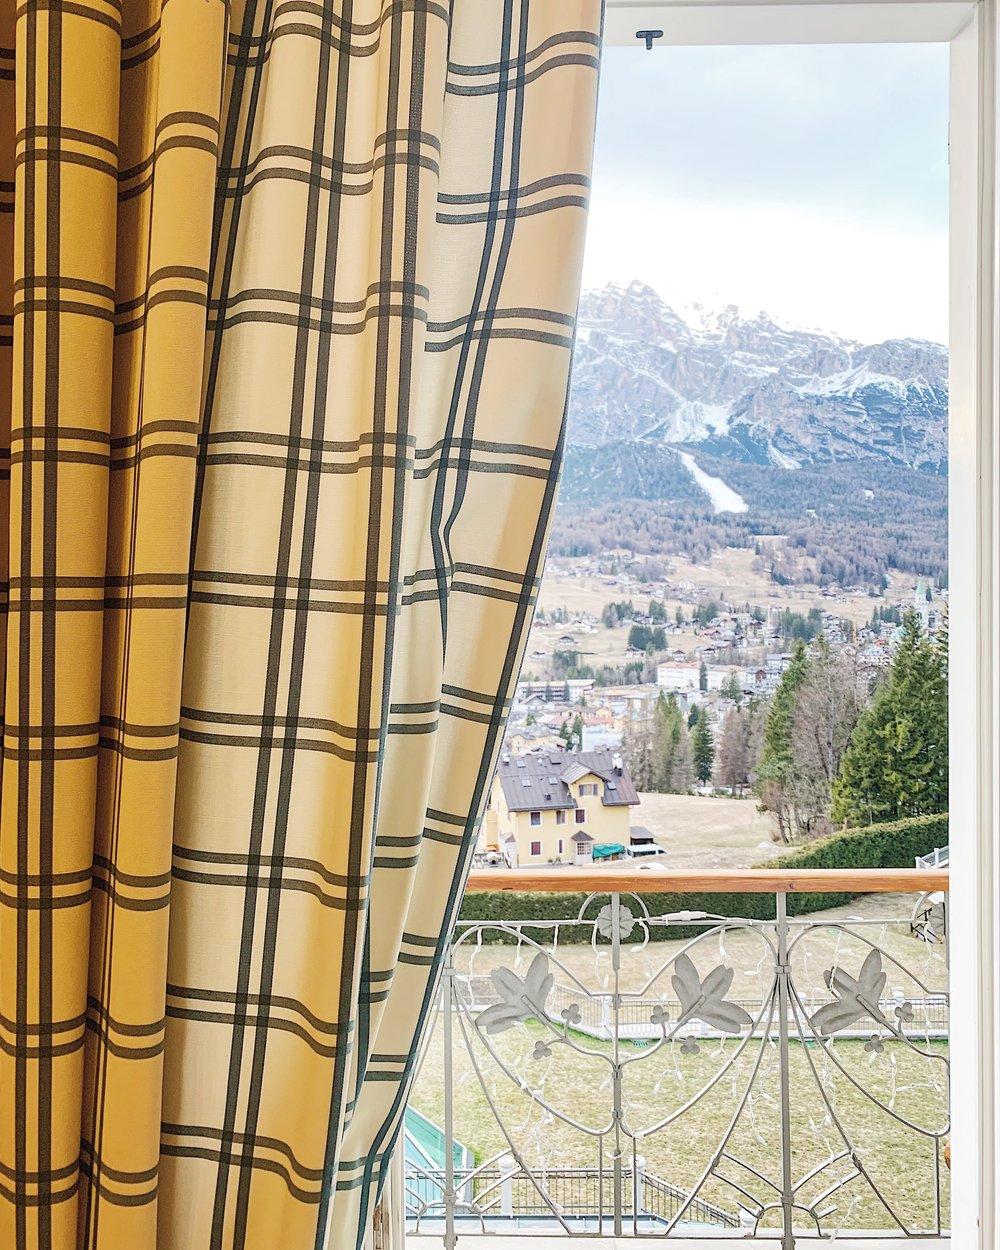 Mountain views from Cristallo Resort & Spa.